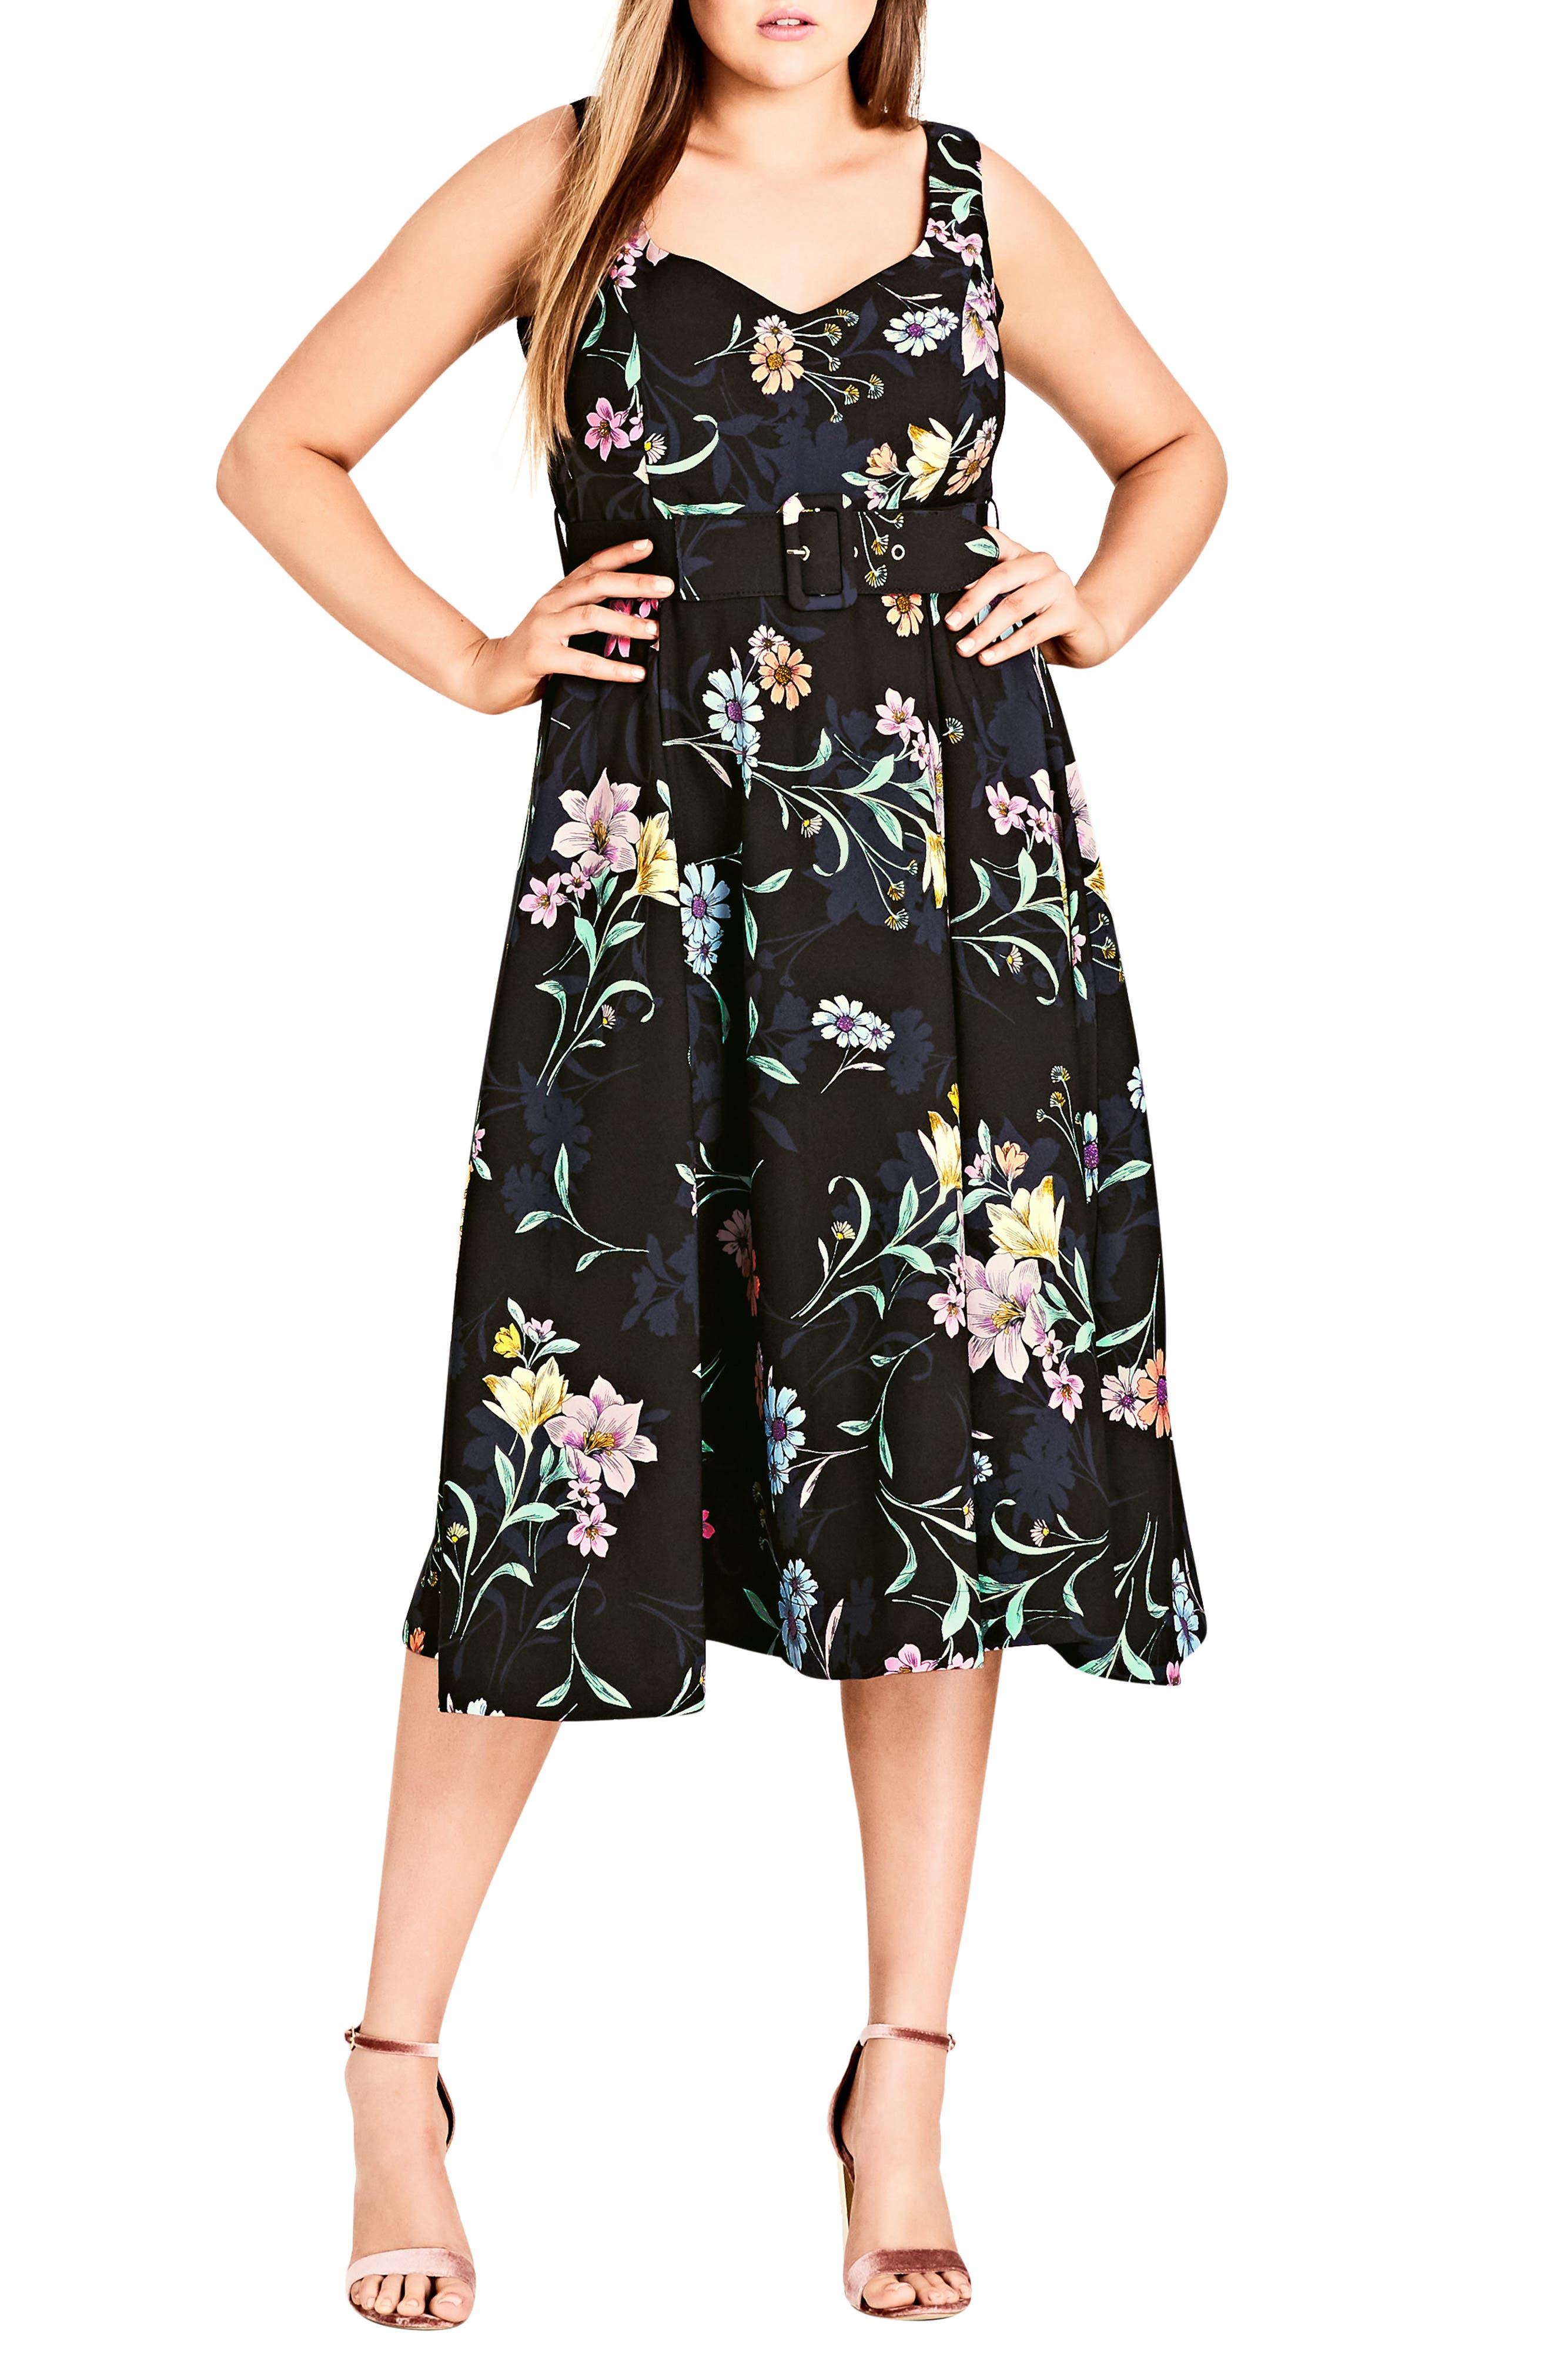 Sketch Love Floral A-Line Midi Dress,                             Main thumbnail 1, color,                             Black